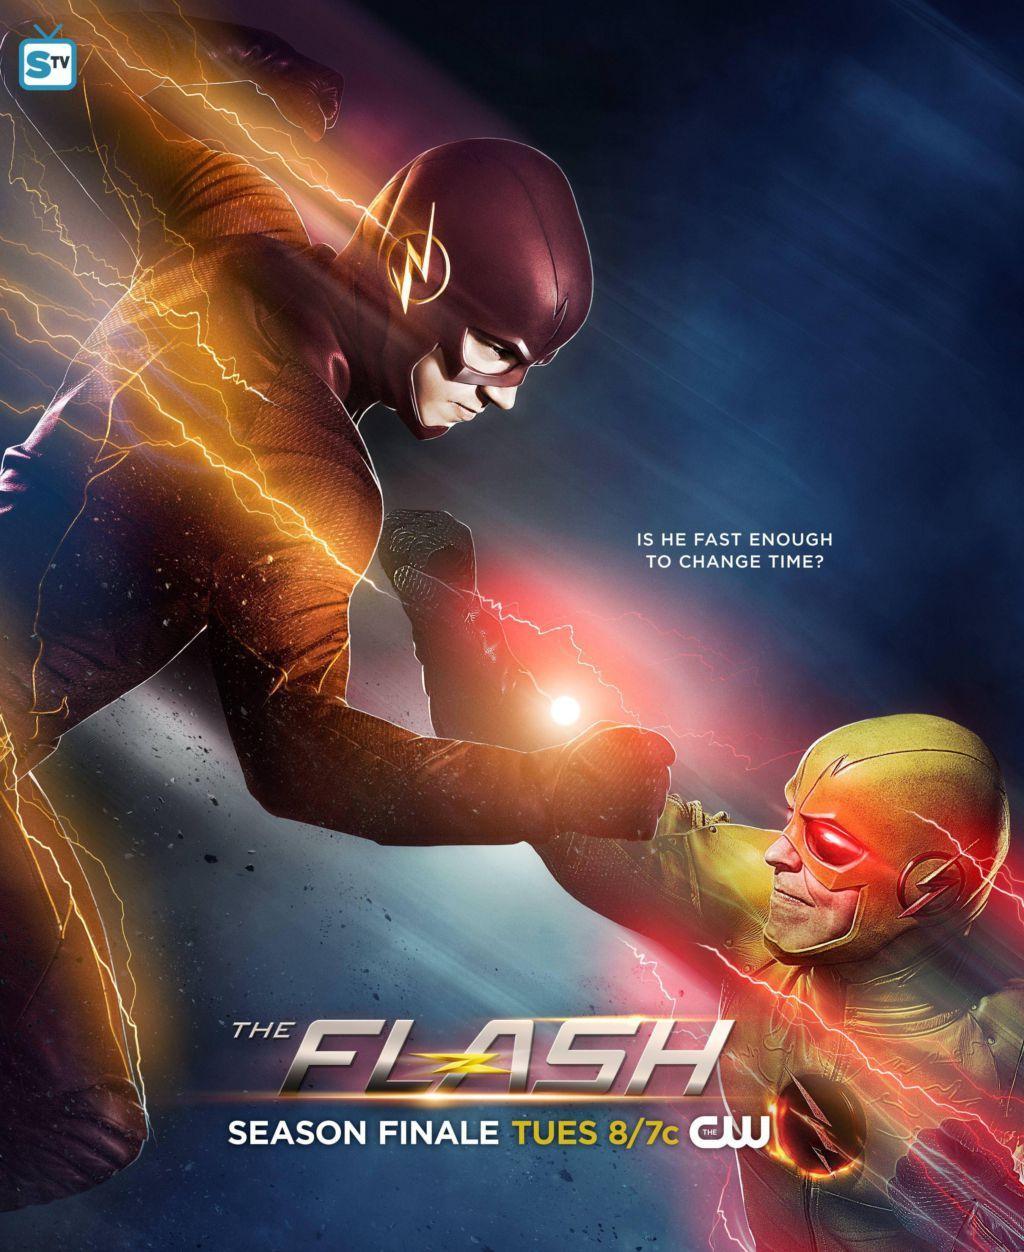 The Flash season 1 (2014)